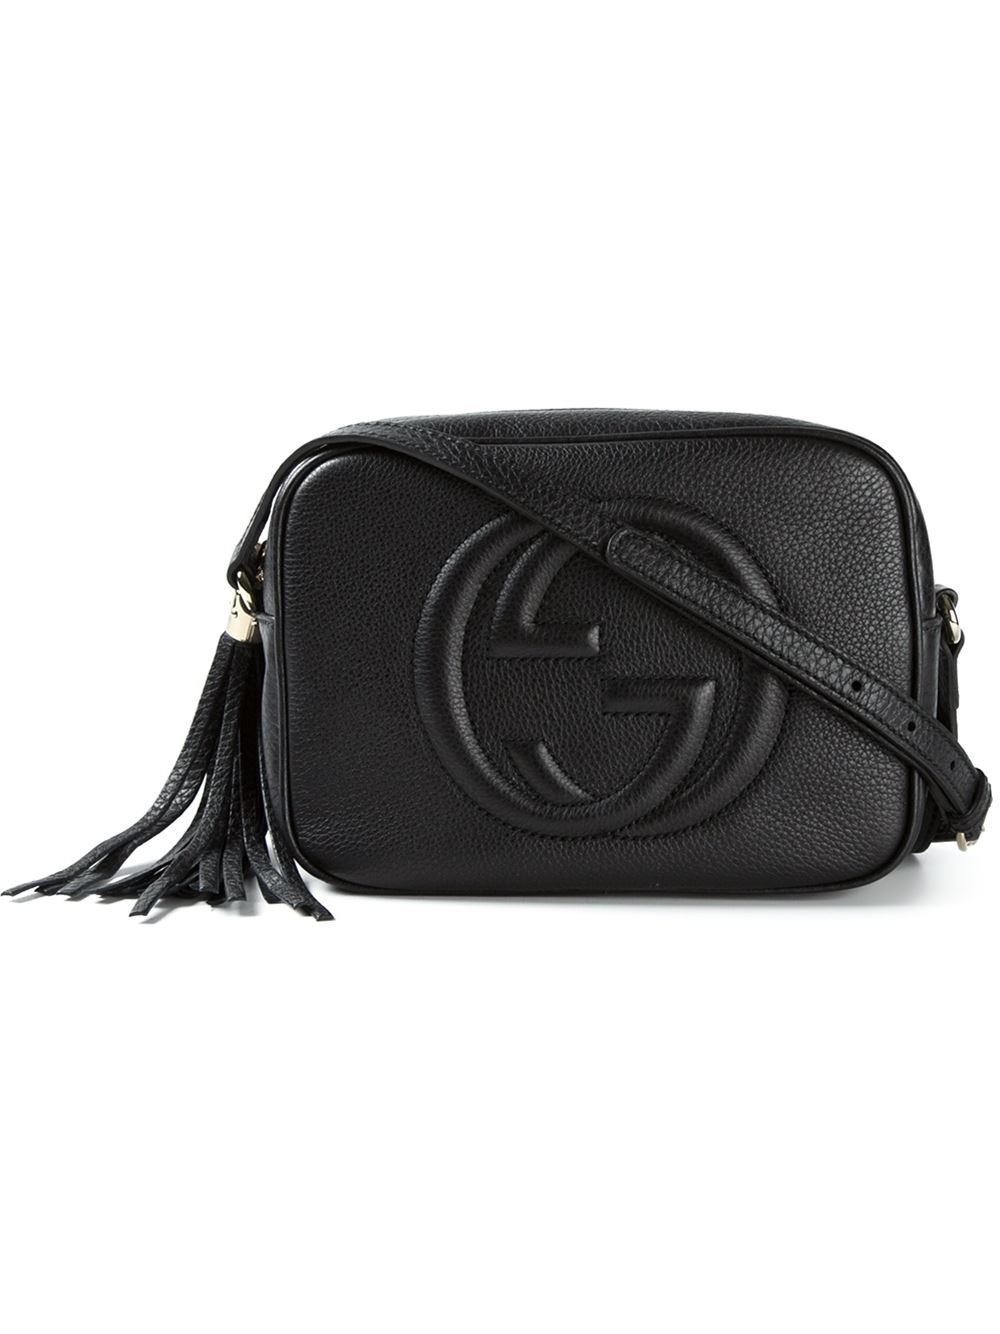 Chloe Black Bag Gucci Soho Leather Cross-body Bag in Black | Lyst